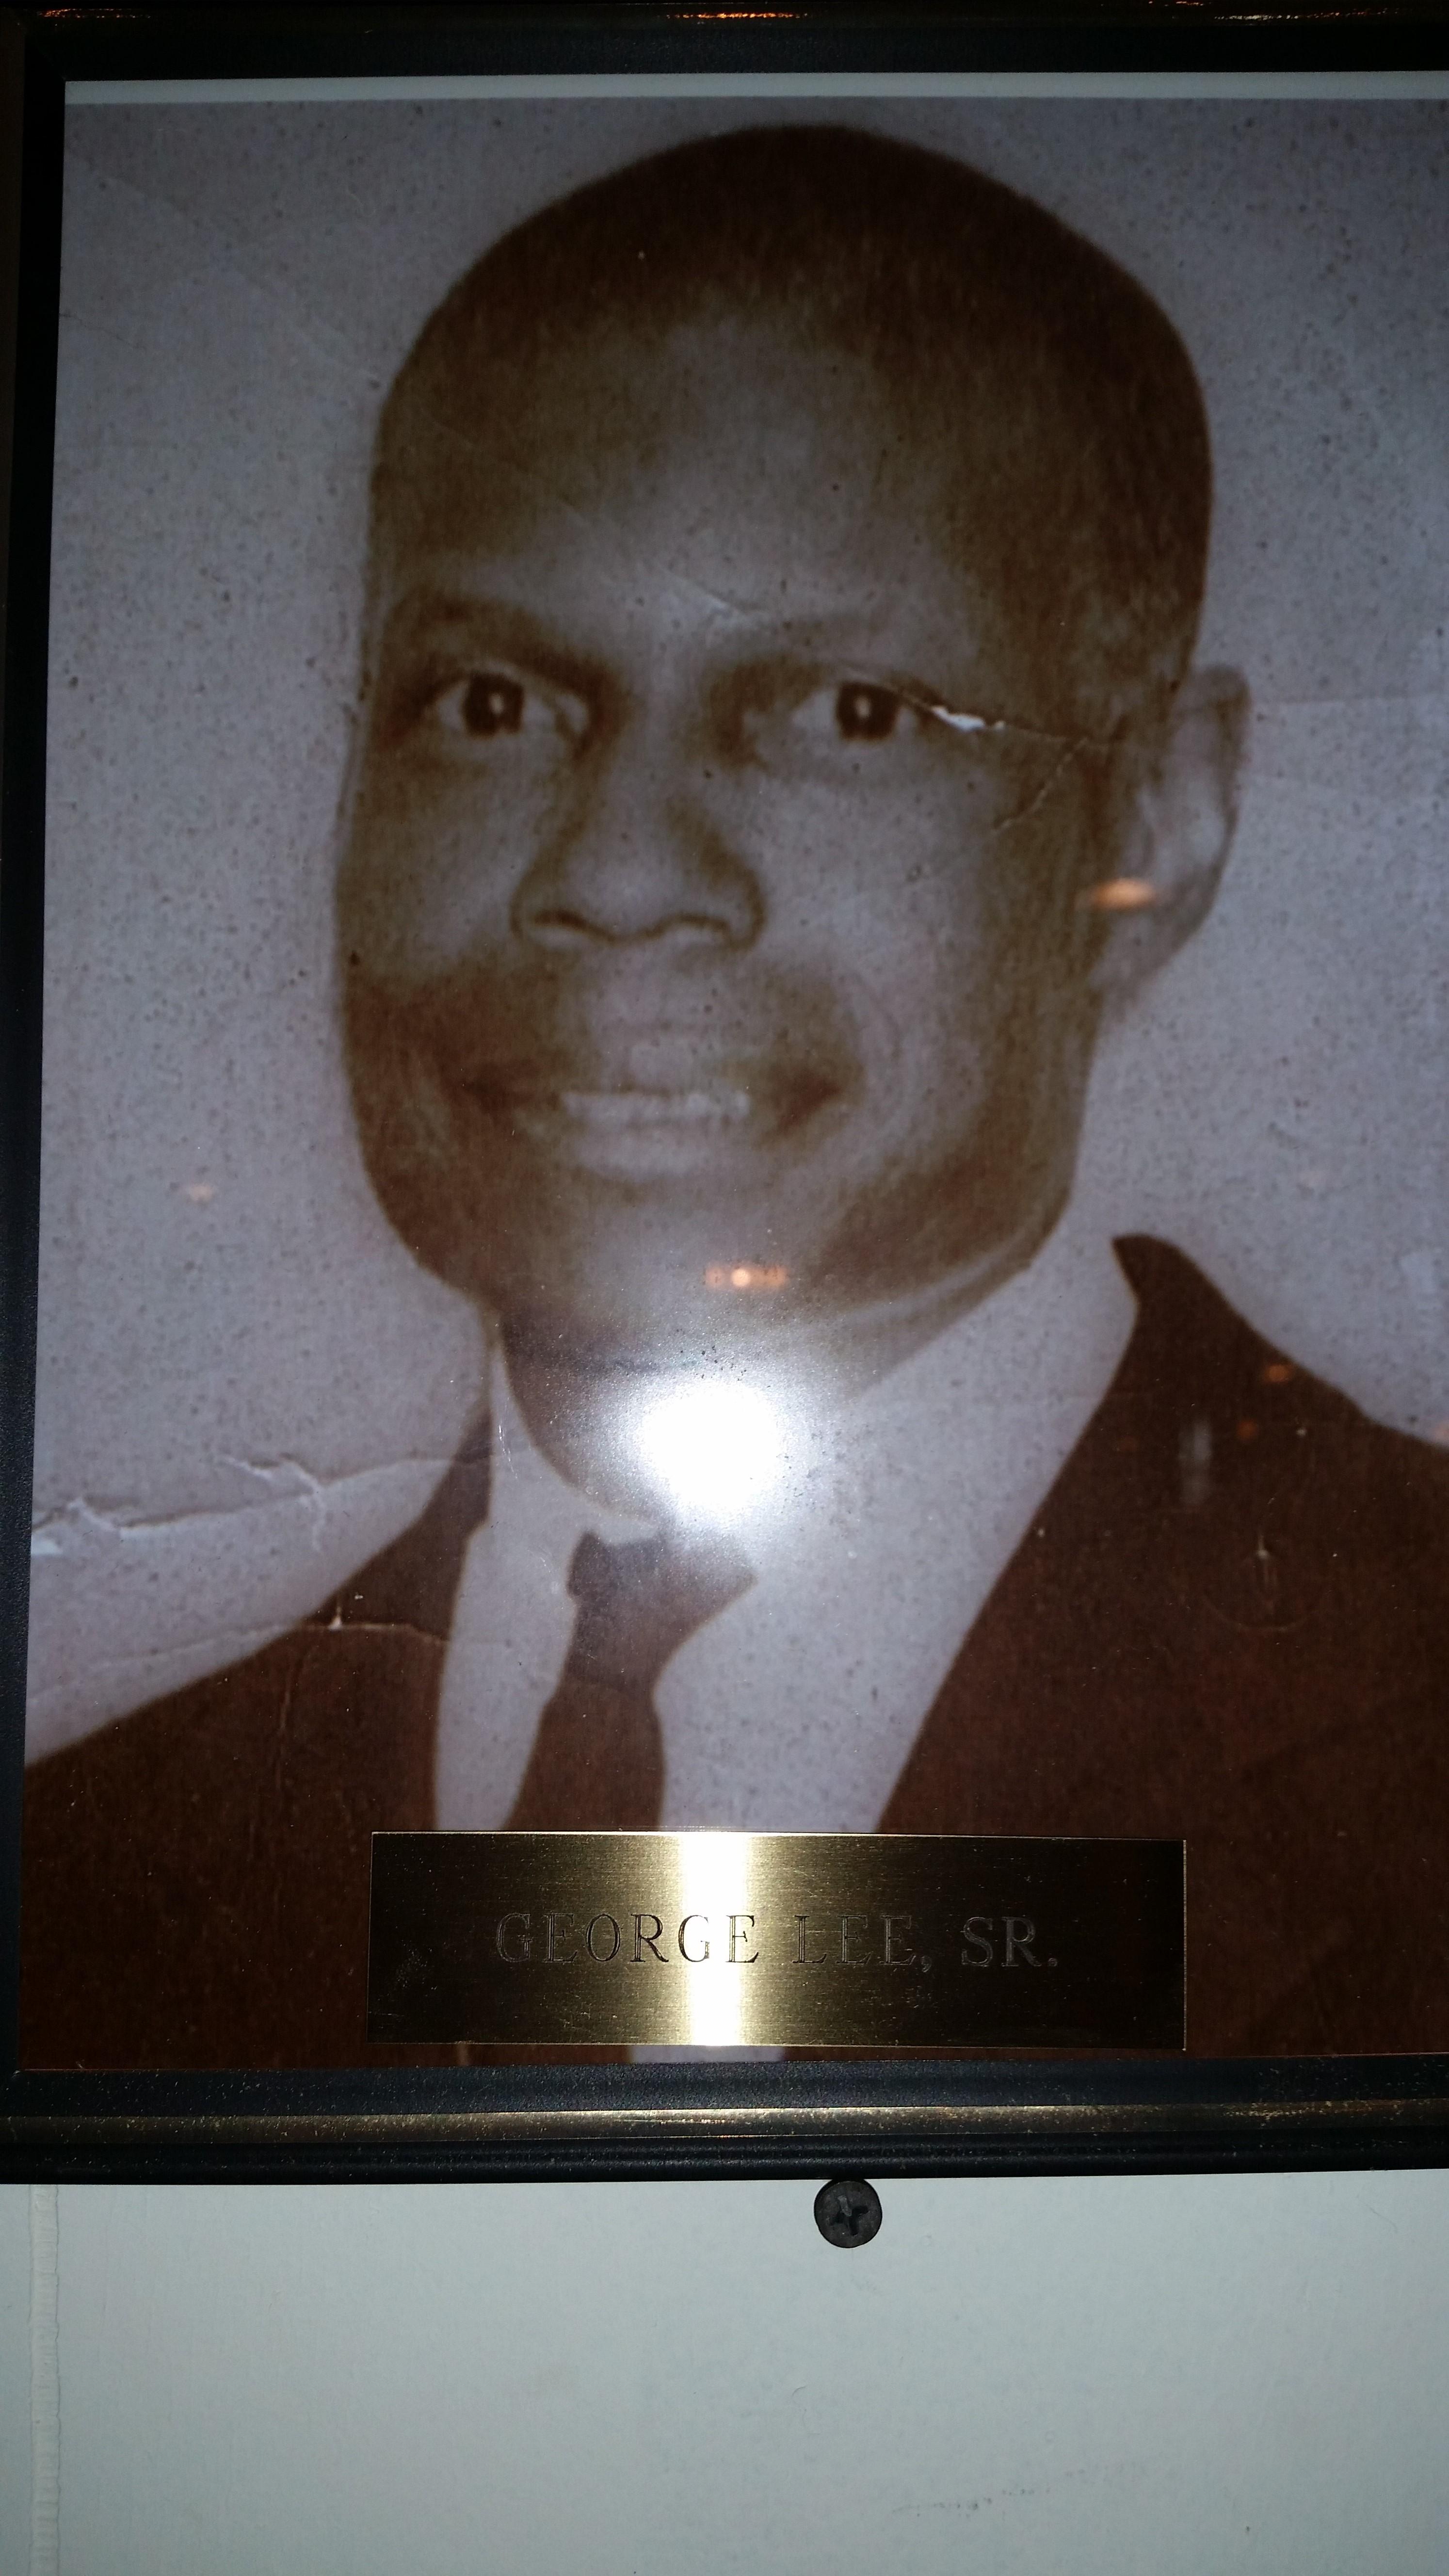 Mr.George Lee, Sr.